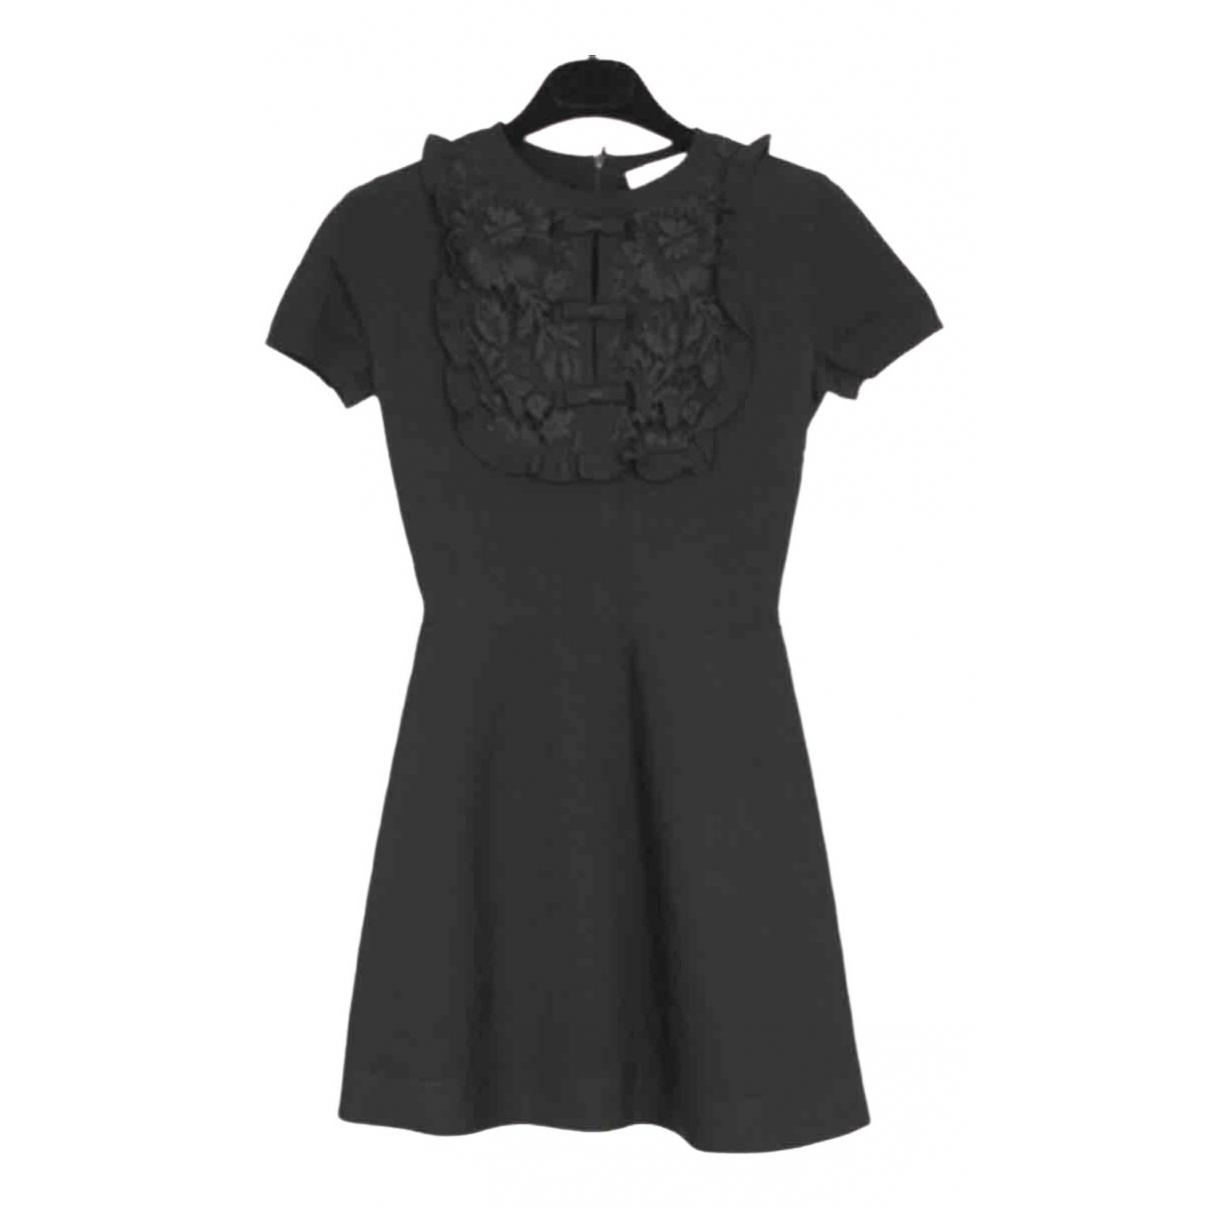 Valentino Garavani \N Black Lace dress for Women XS International